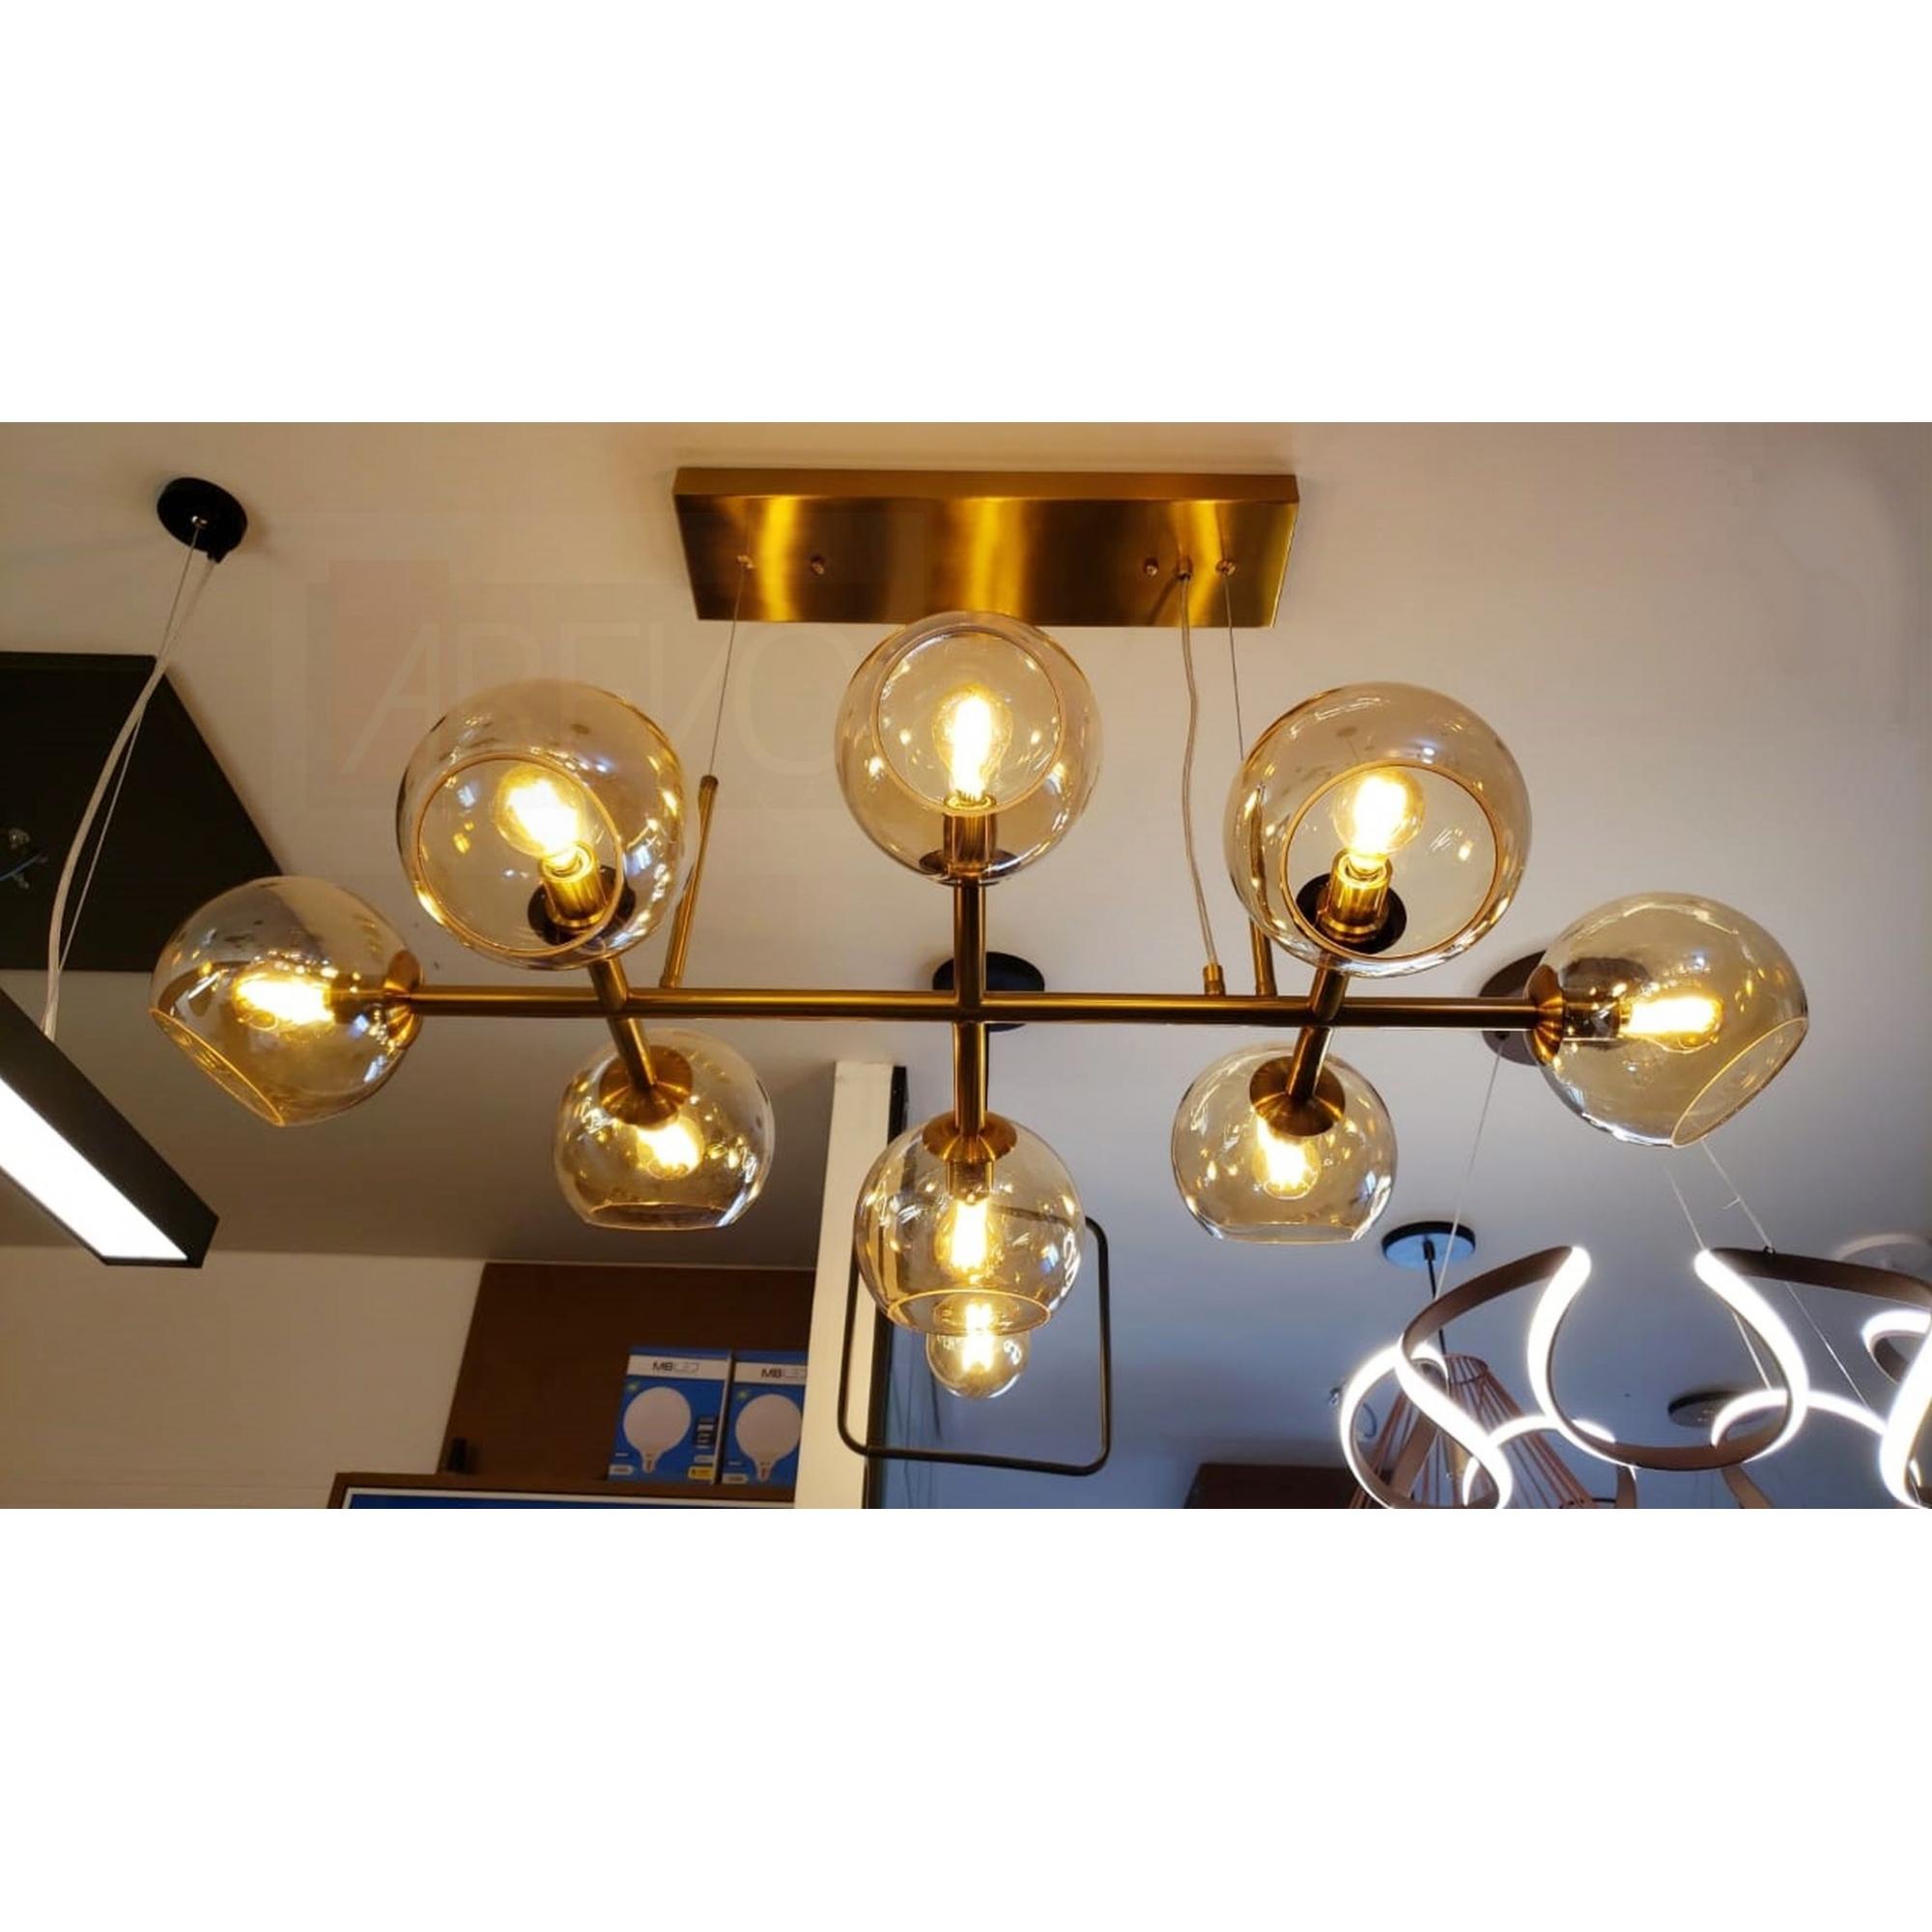 Lustre Pendente Moderno Jabuticaba 8 Lâmpadas Bronze Mesa Gourmet Sala Bancada Passa Prato